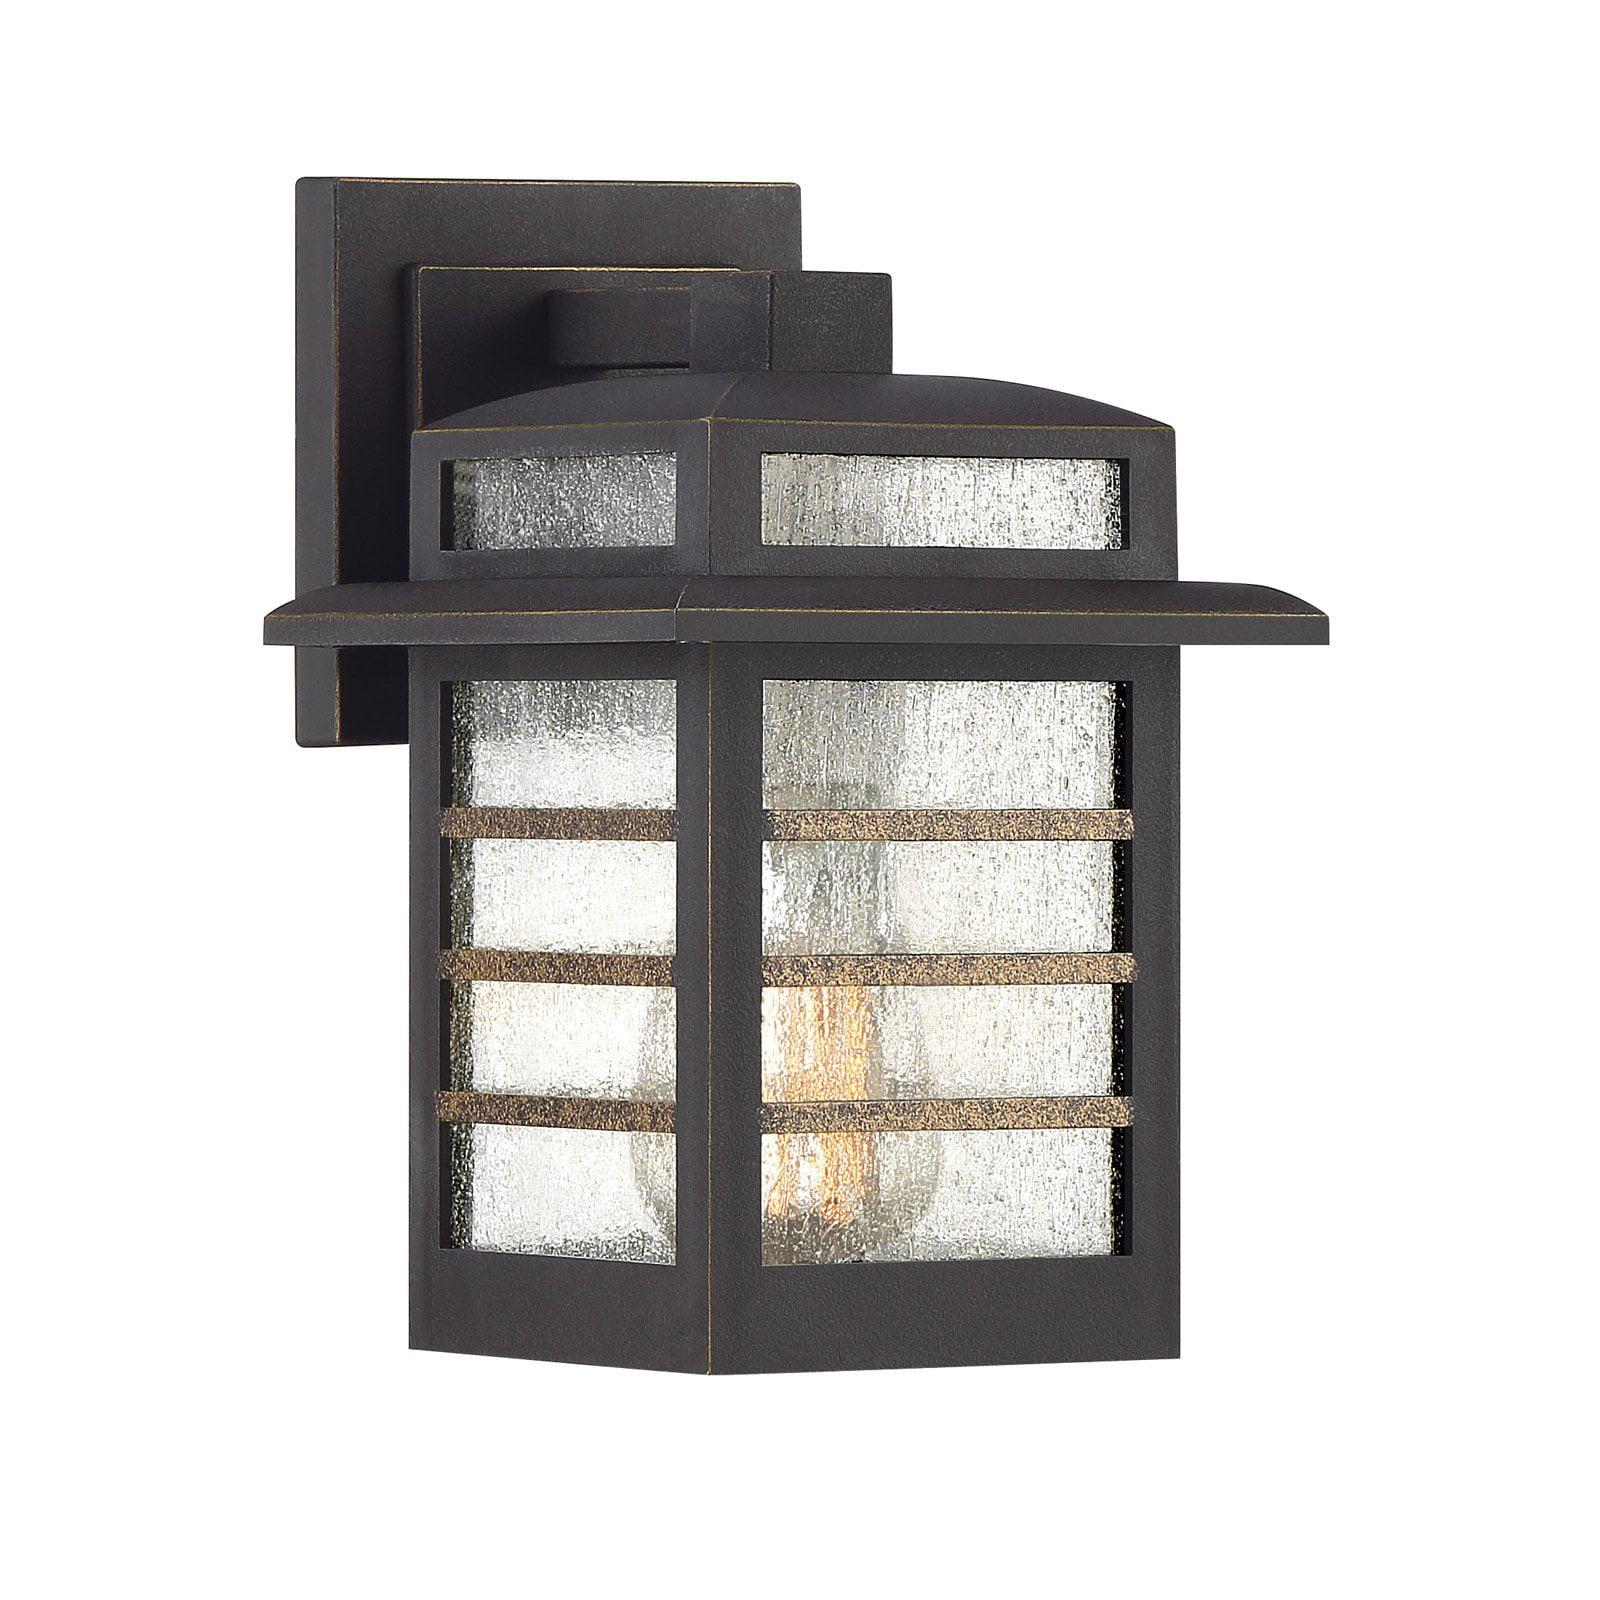 Quoizel Plaza PLA8406PN Outdoor Wall Lantern